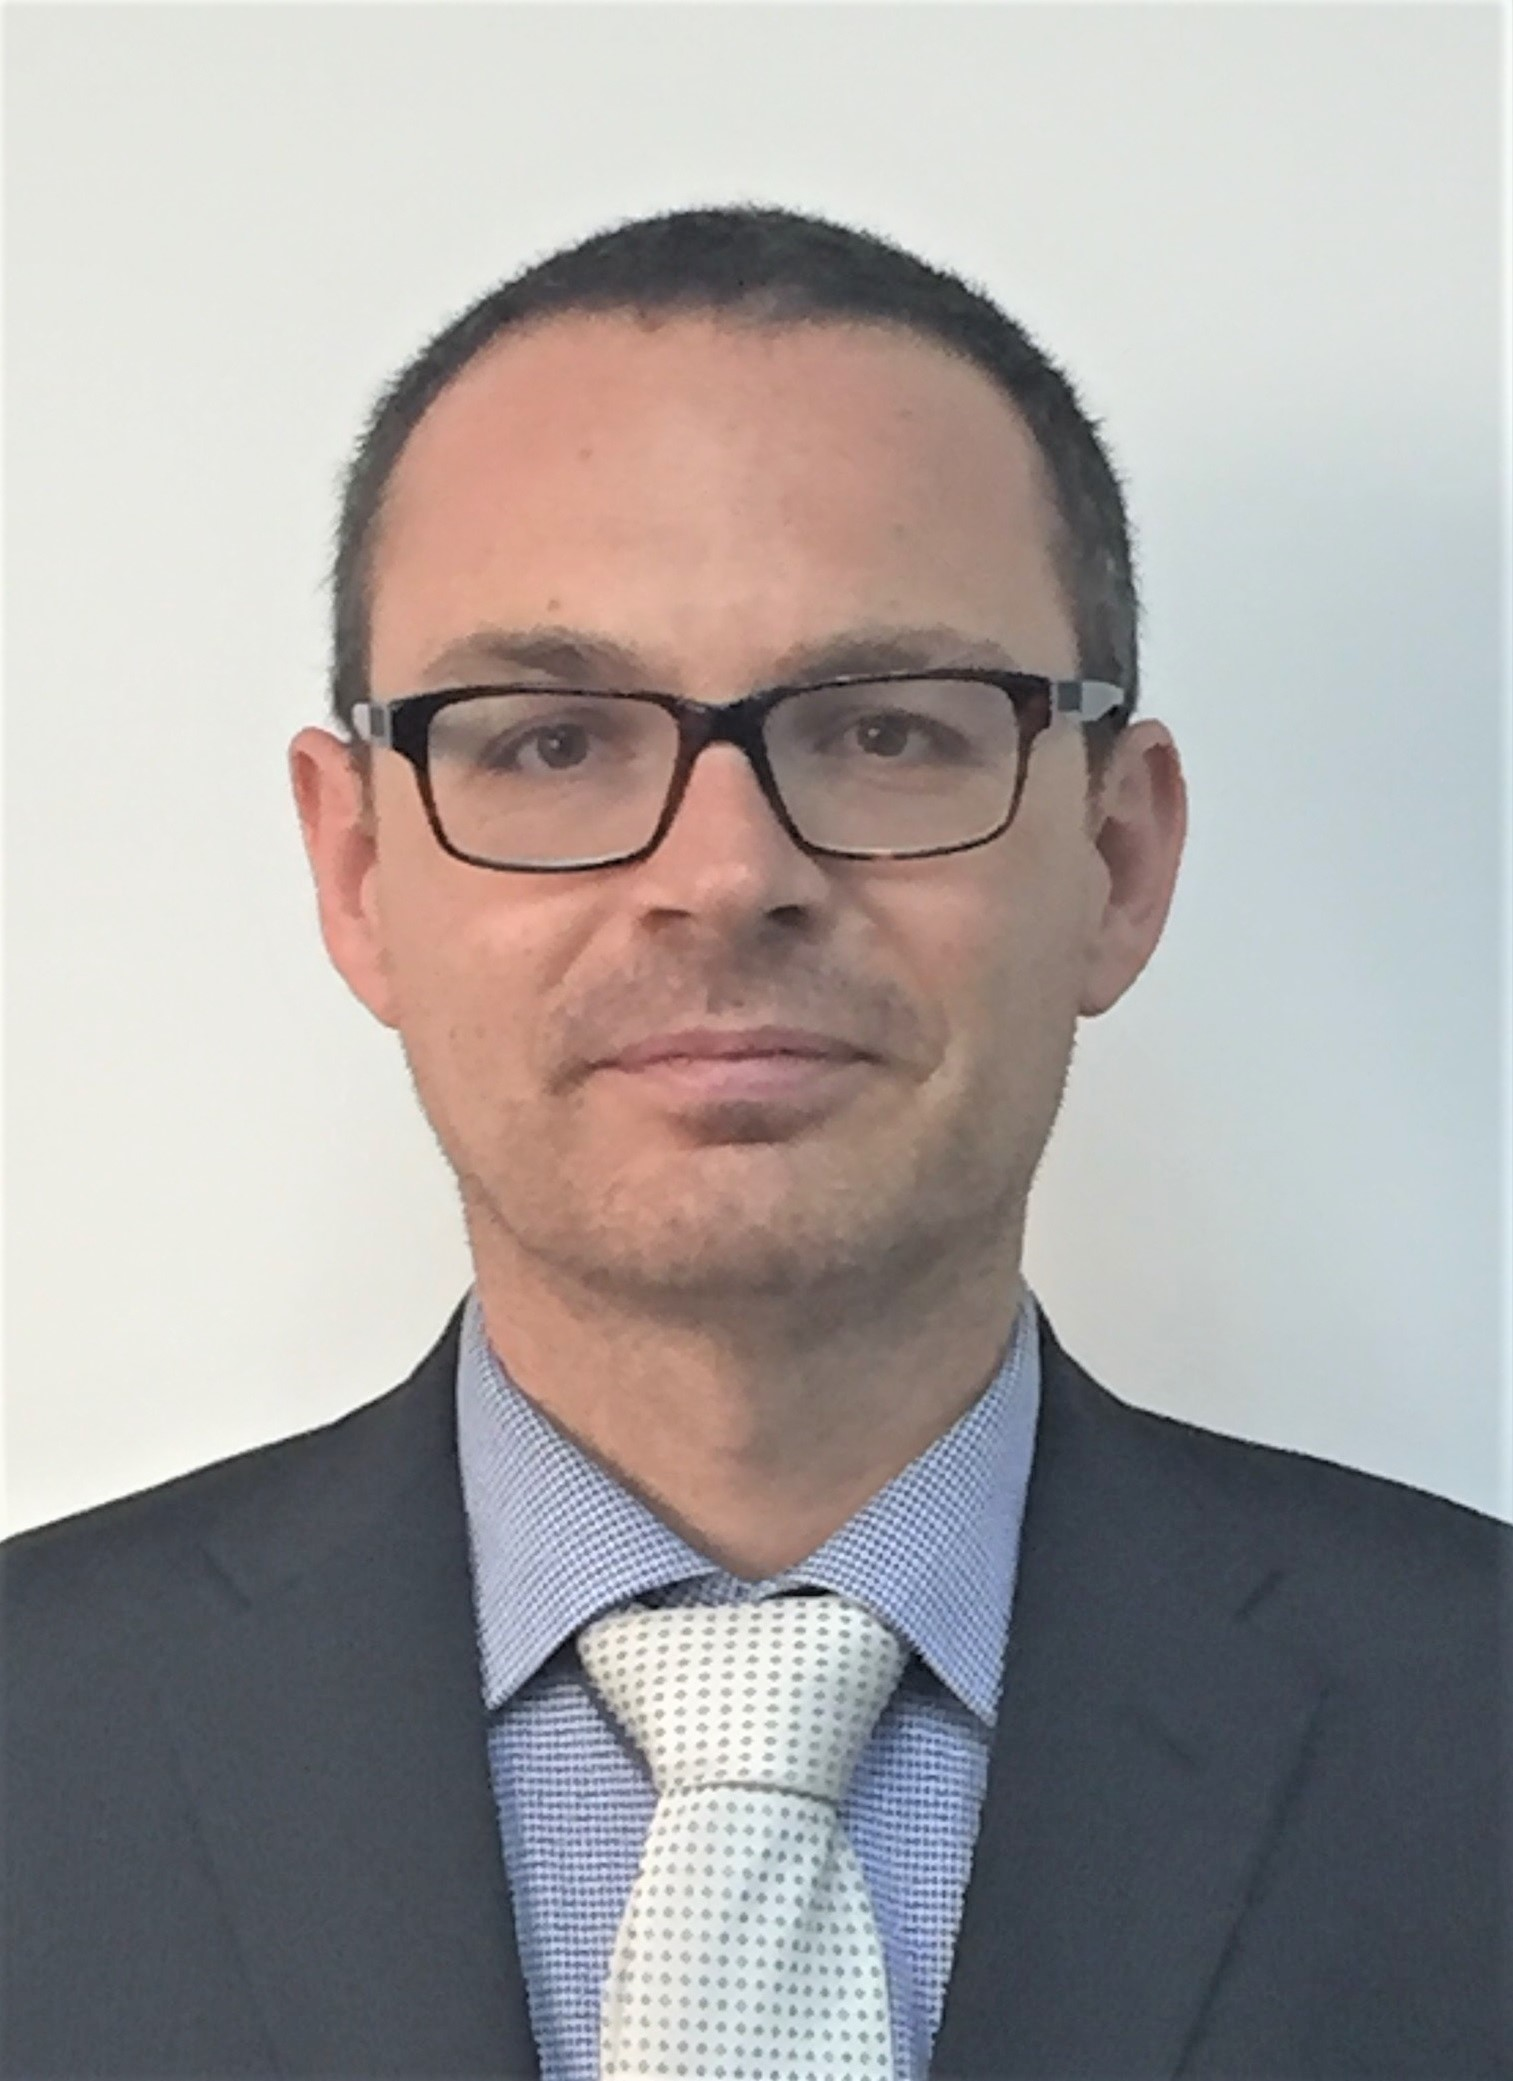 Fabrizio, Antonio DURANTE